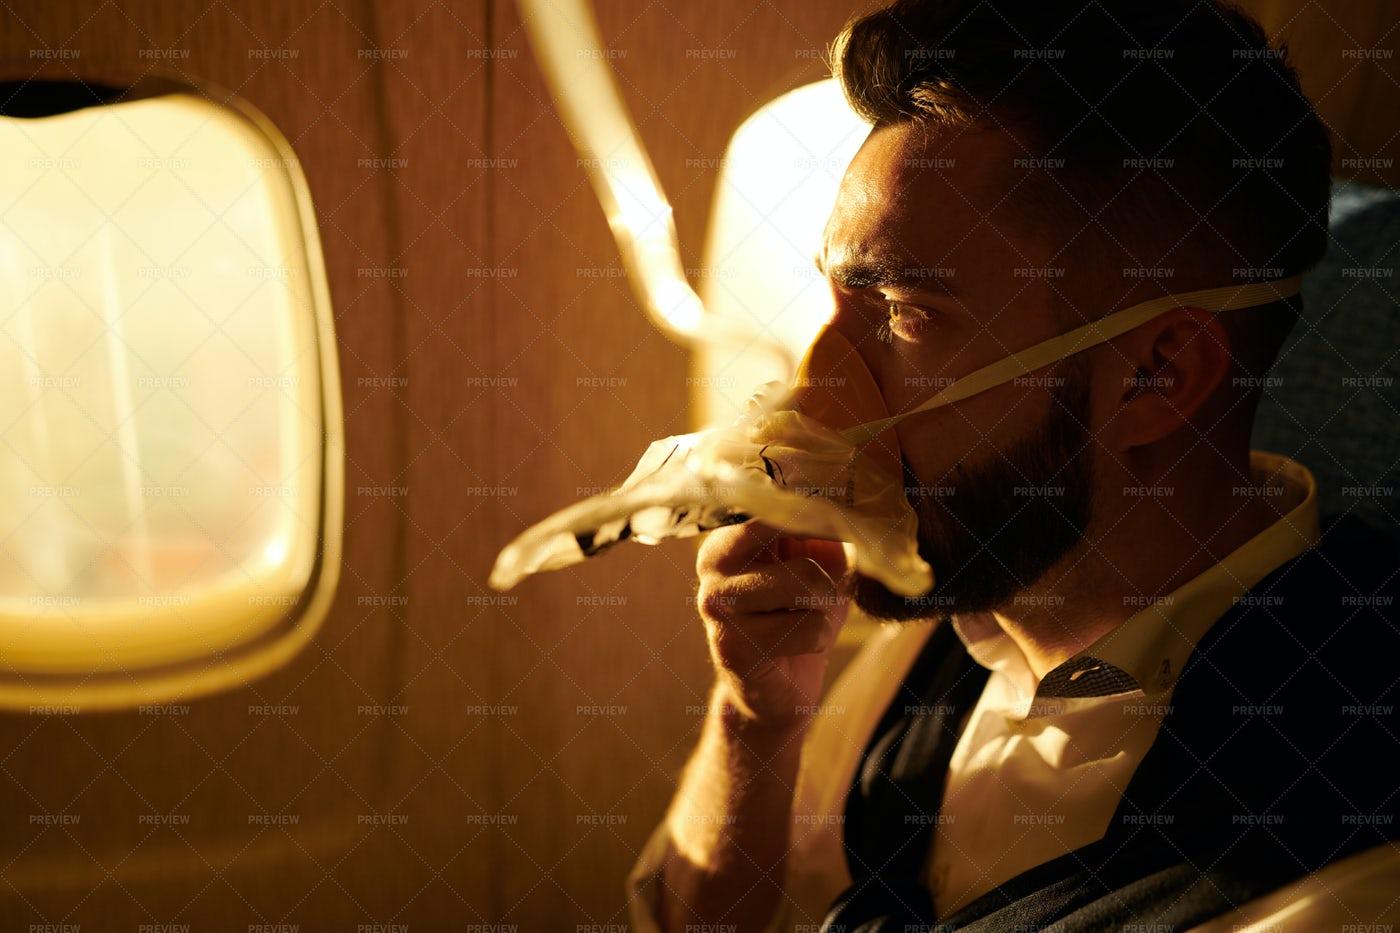 Man Breathing Oxygen In Plane: Stock Photos